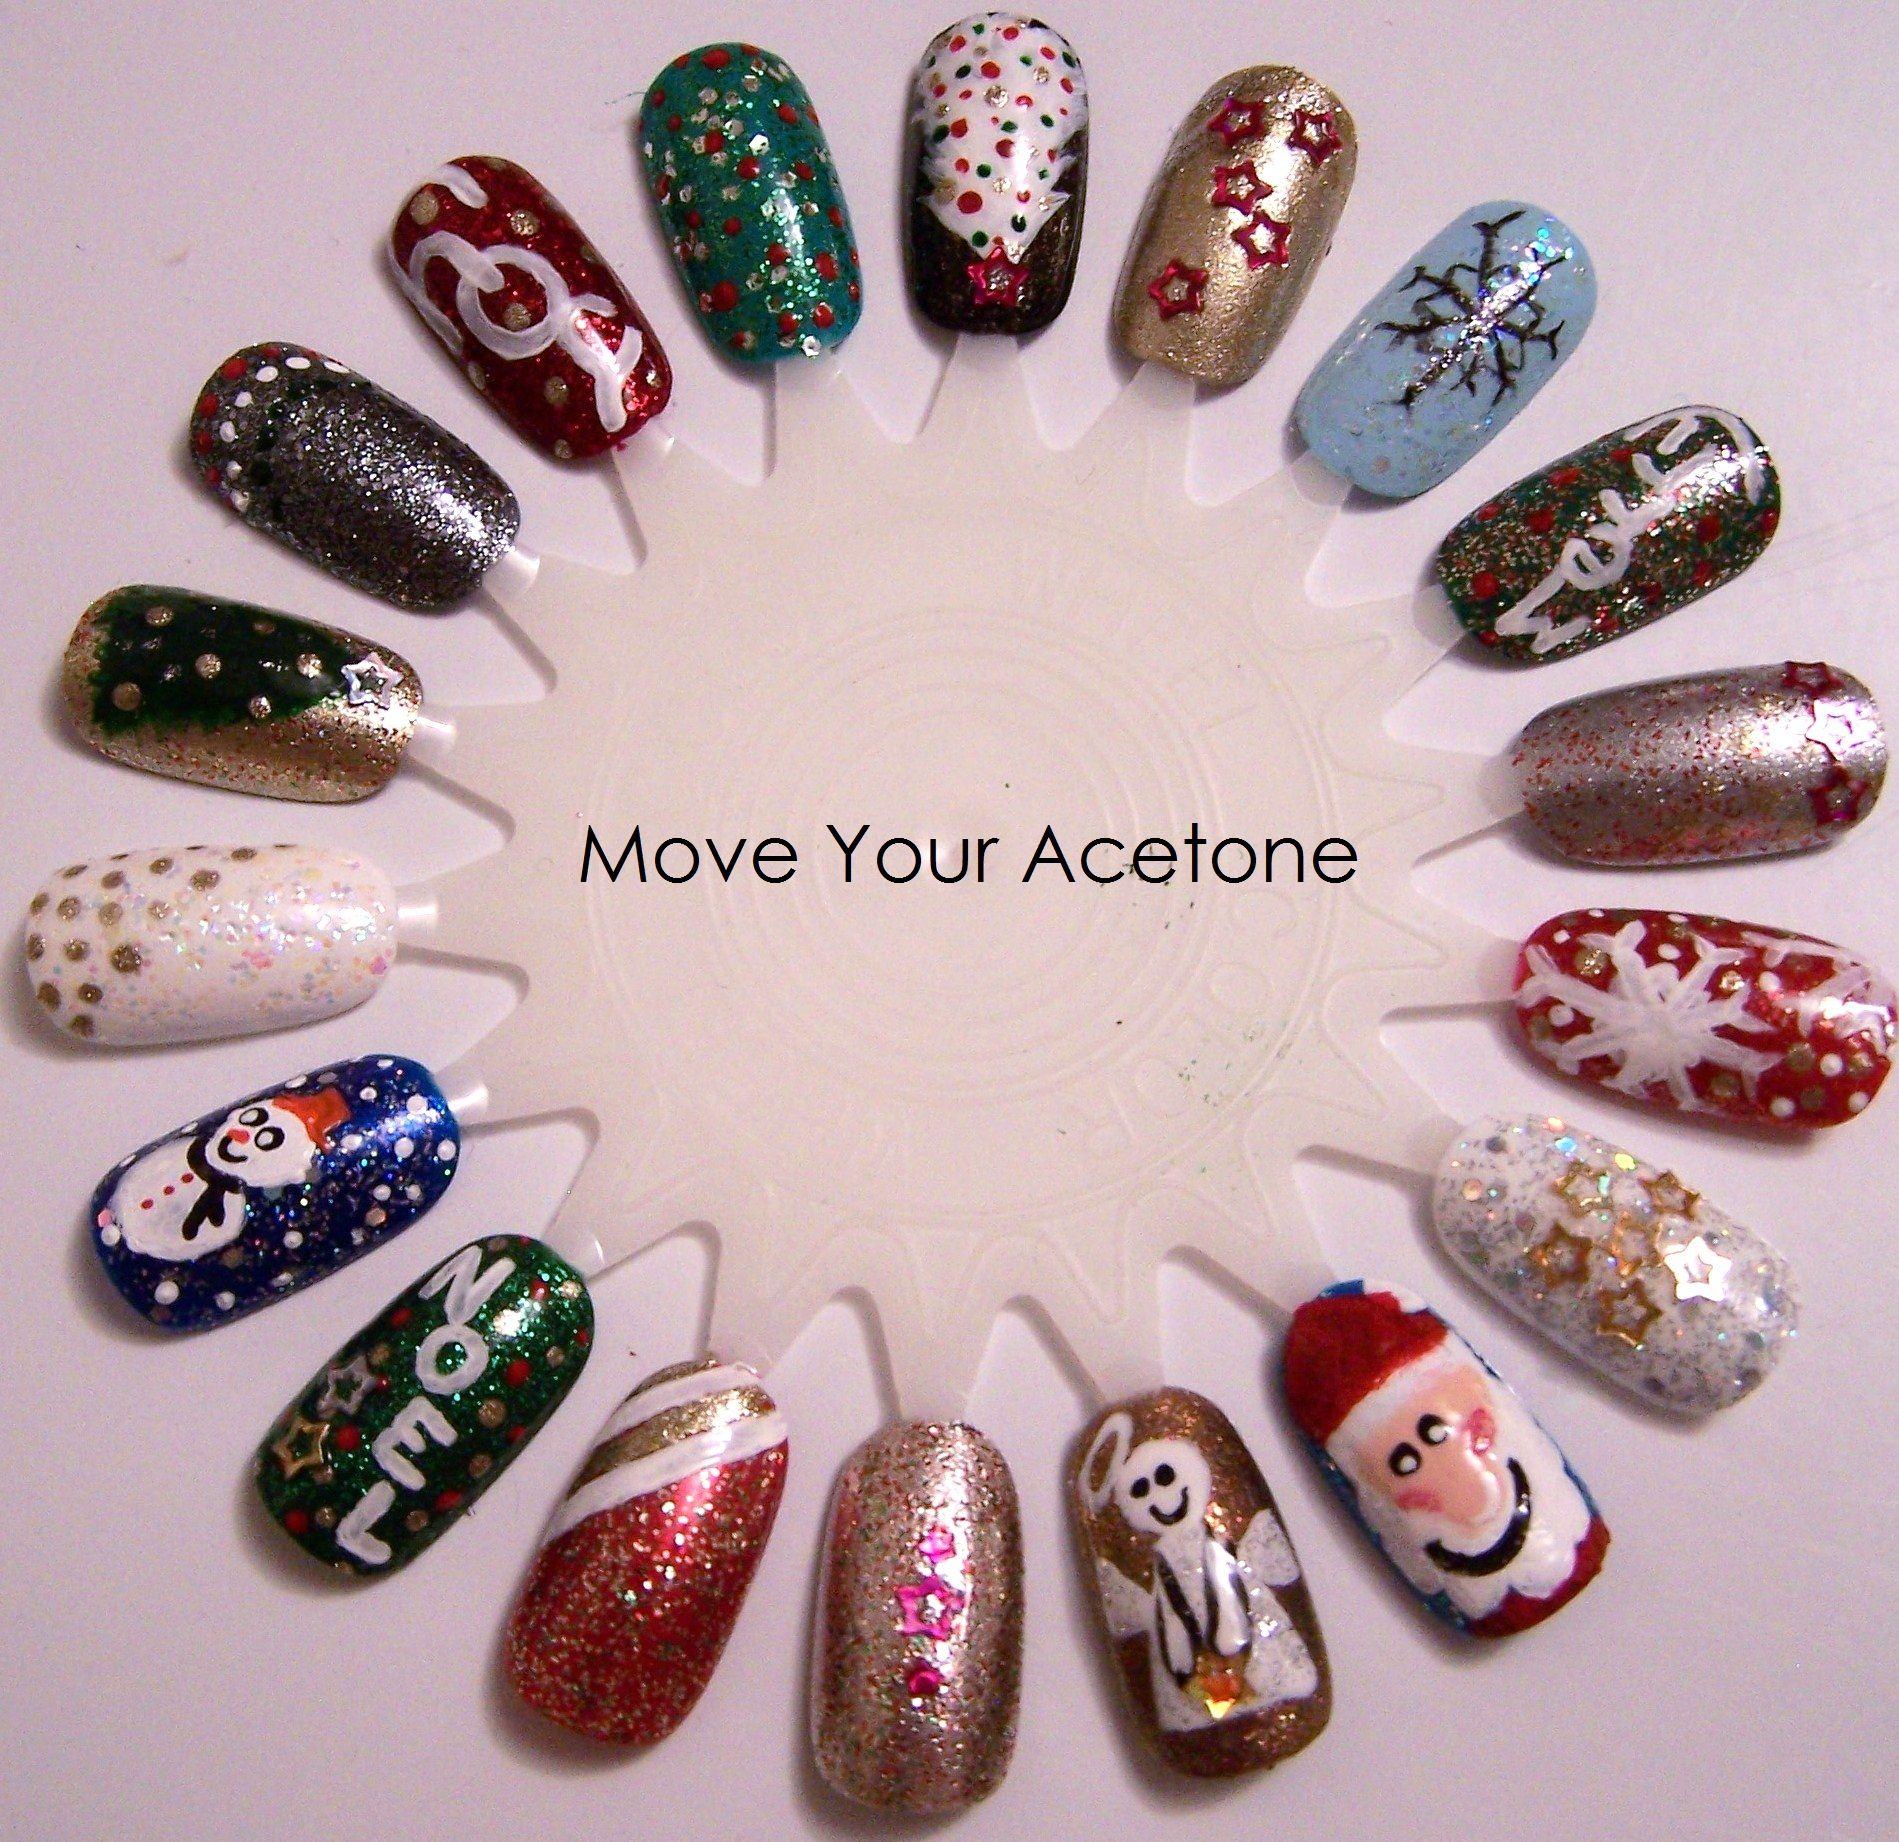 Pins check out www mynailpolishobsession com for more nail art ideas - Christmas Nail Art Ideas Check Out Www Mynailpolishobsession Com For More Nail Art Ideas